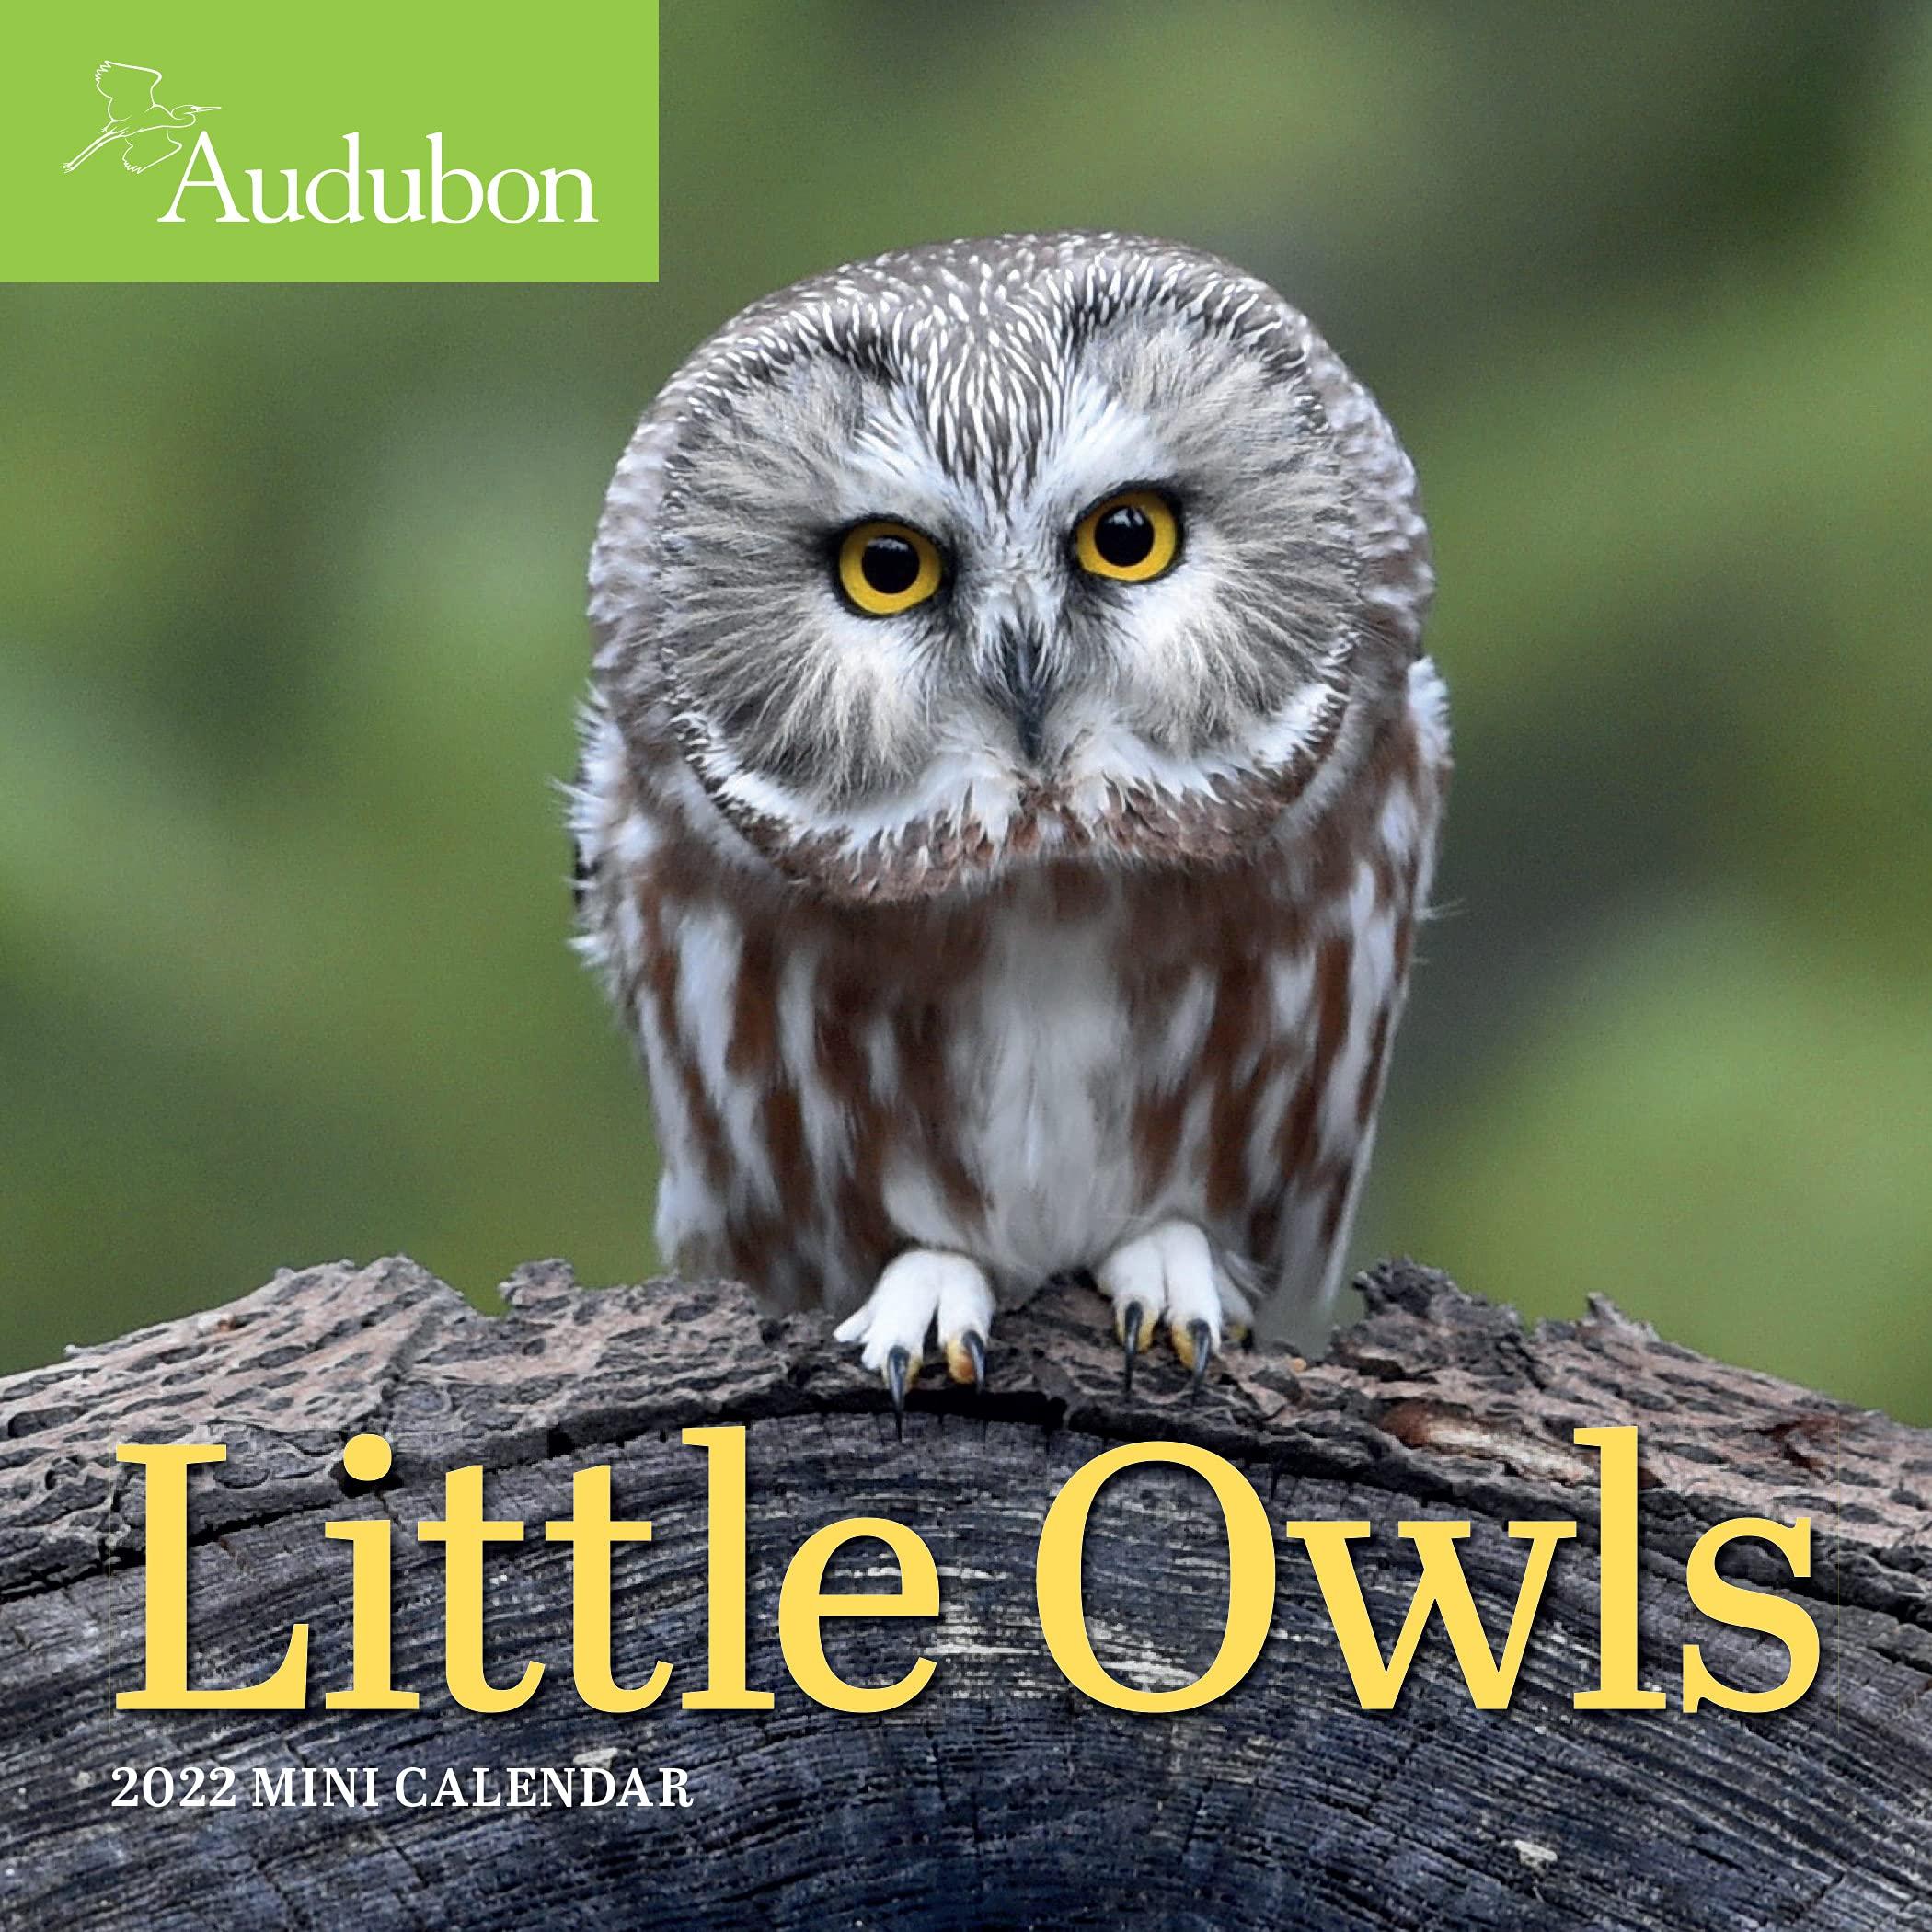 Calendar 2022 - Little Owls | Workman Publishing image0